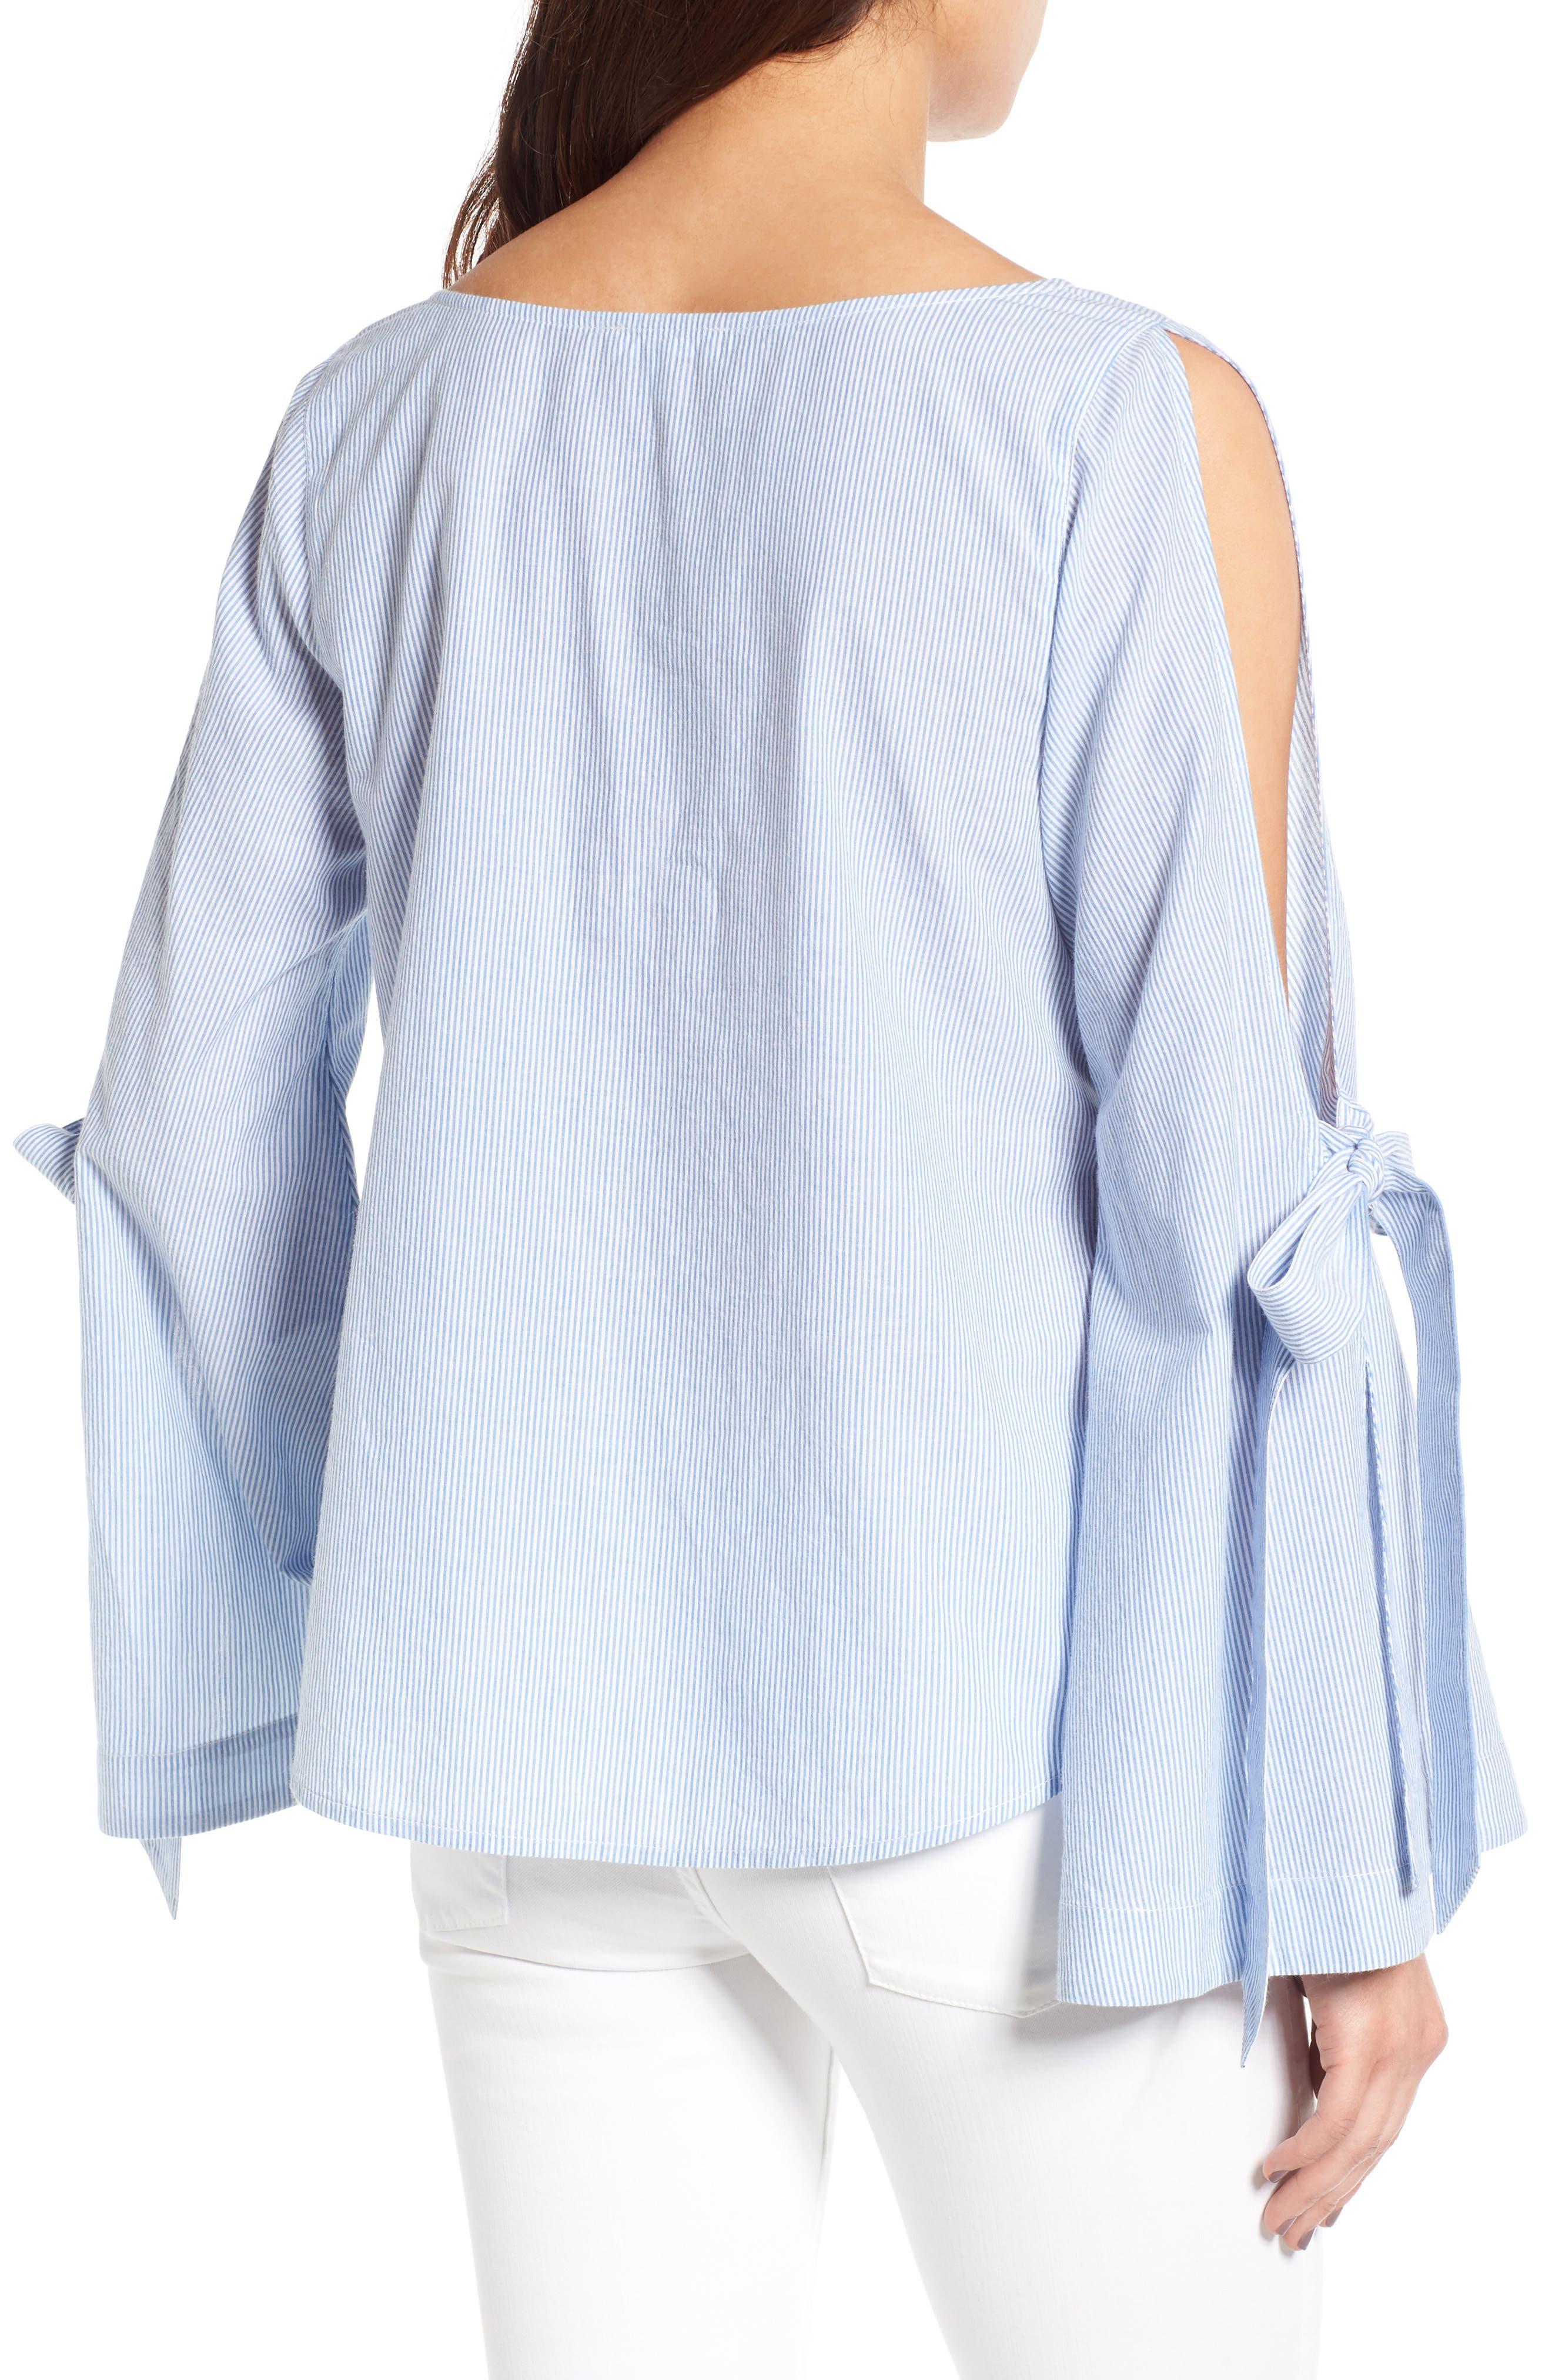 Tie Sleeve Blouse,                             Alternate thumbnail 2, color,                             Blue Tw Jny Stp